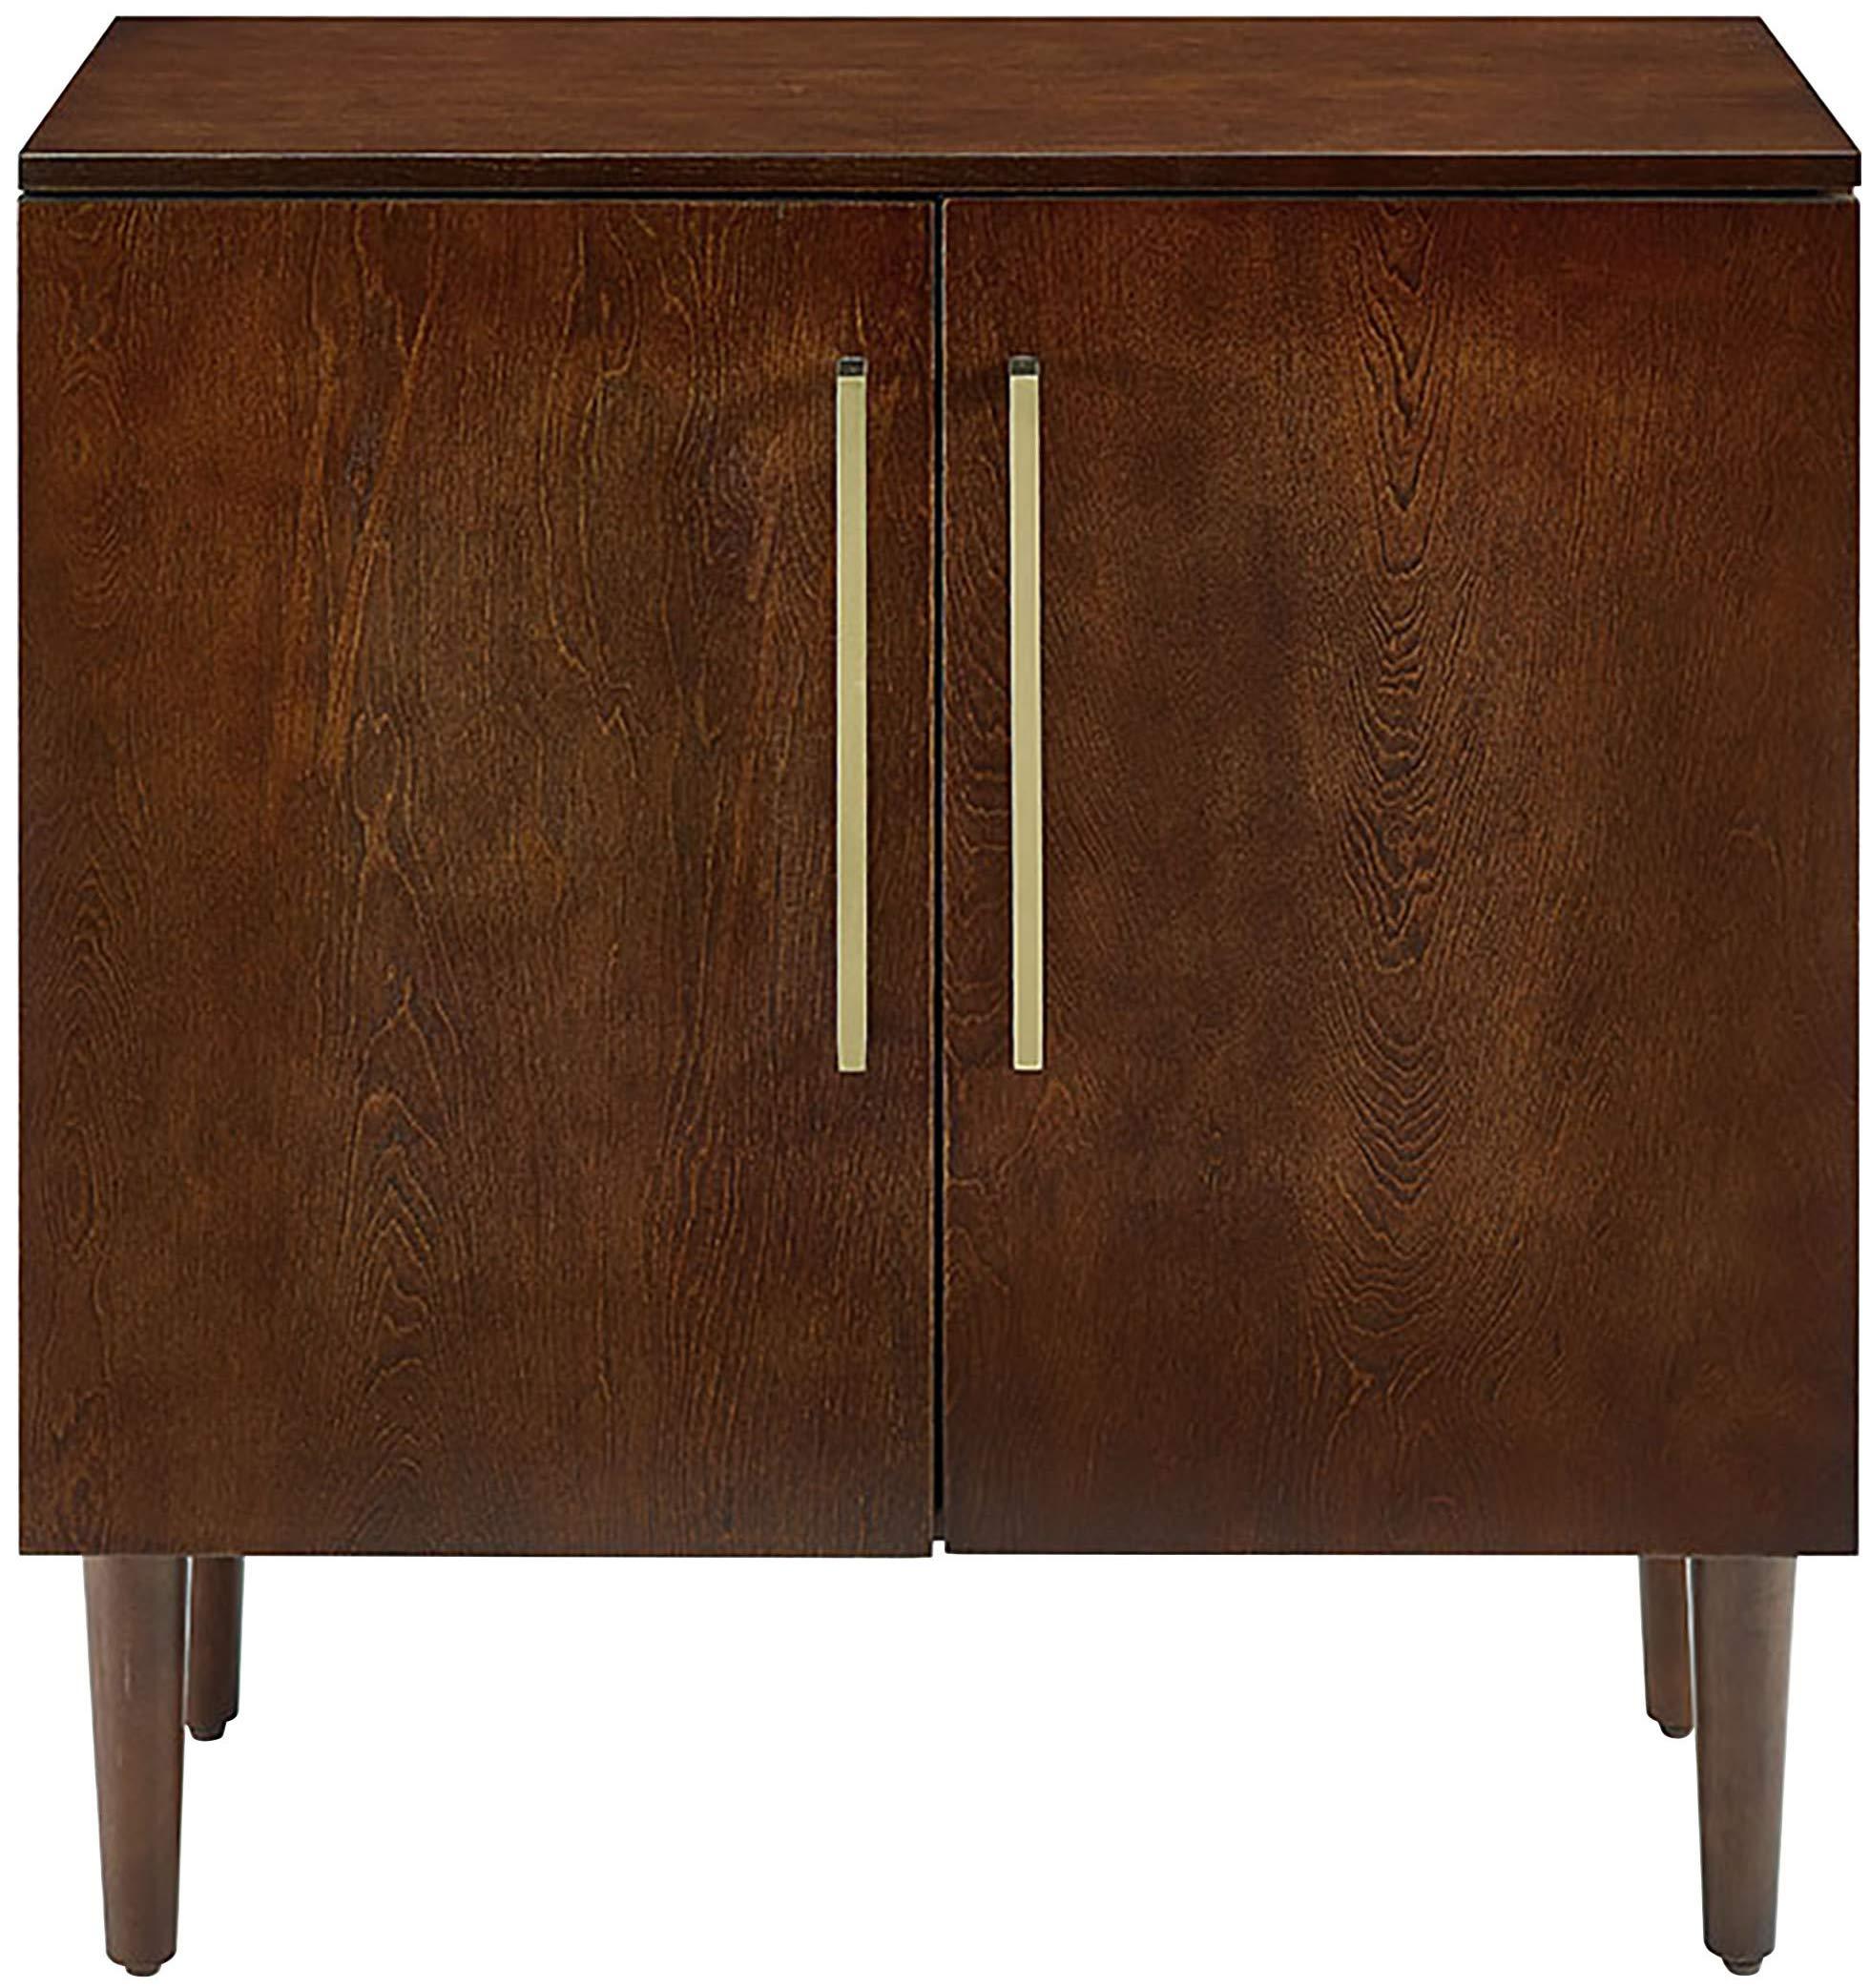 Crosley Furniture Everett Mid-Century Modern Console Cabinet, Mahogany by Crosley Furniture